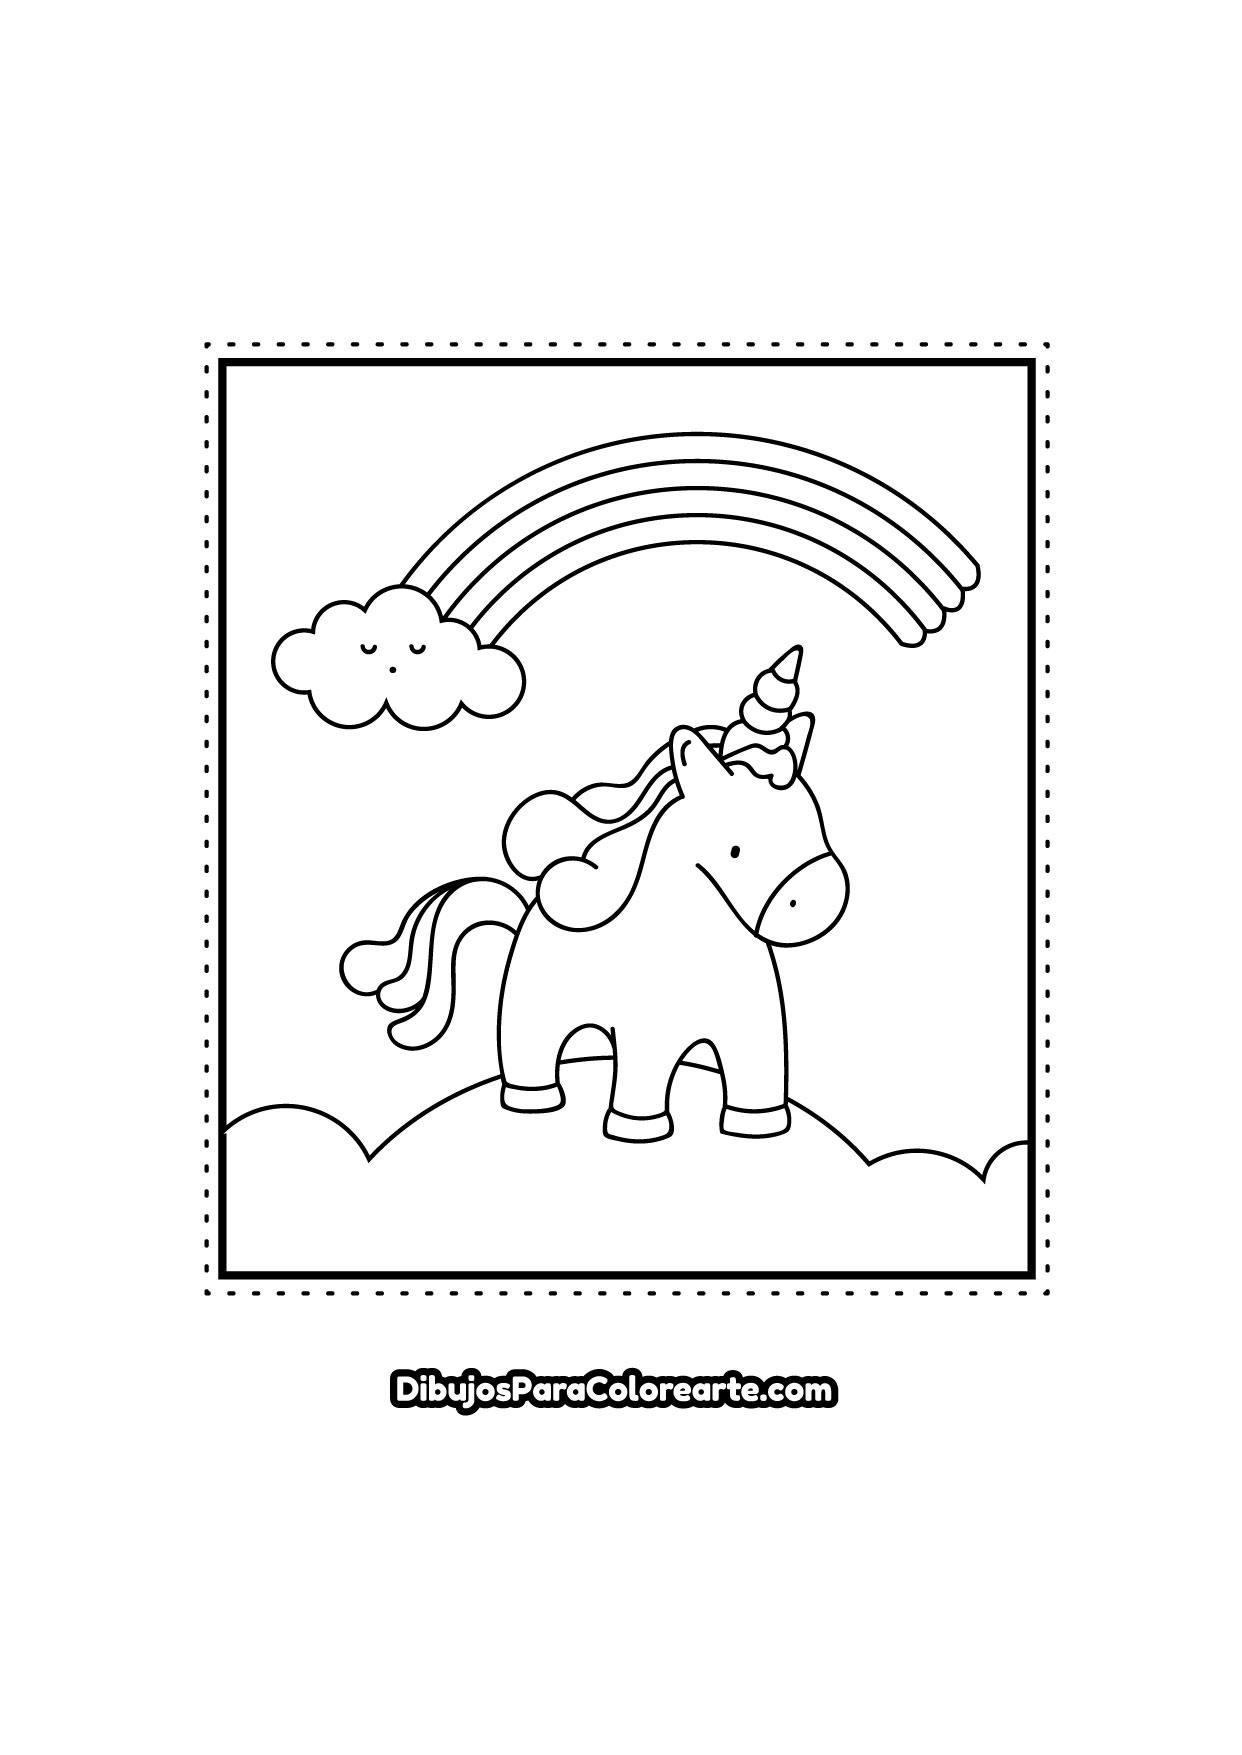 Dibujos Para Colorear Unicornios Bellisimos